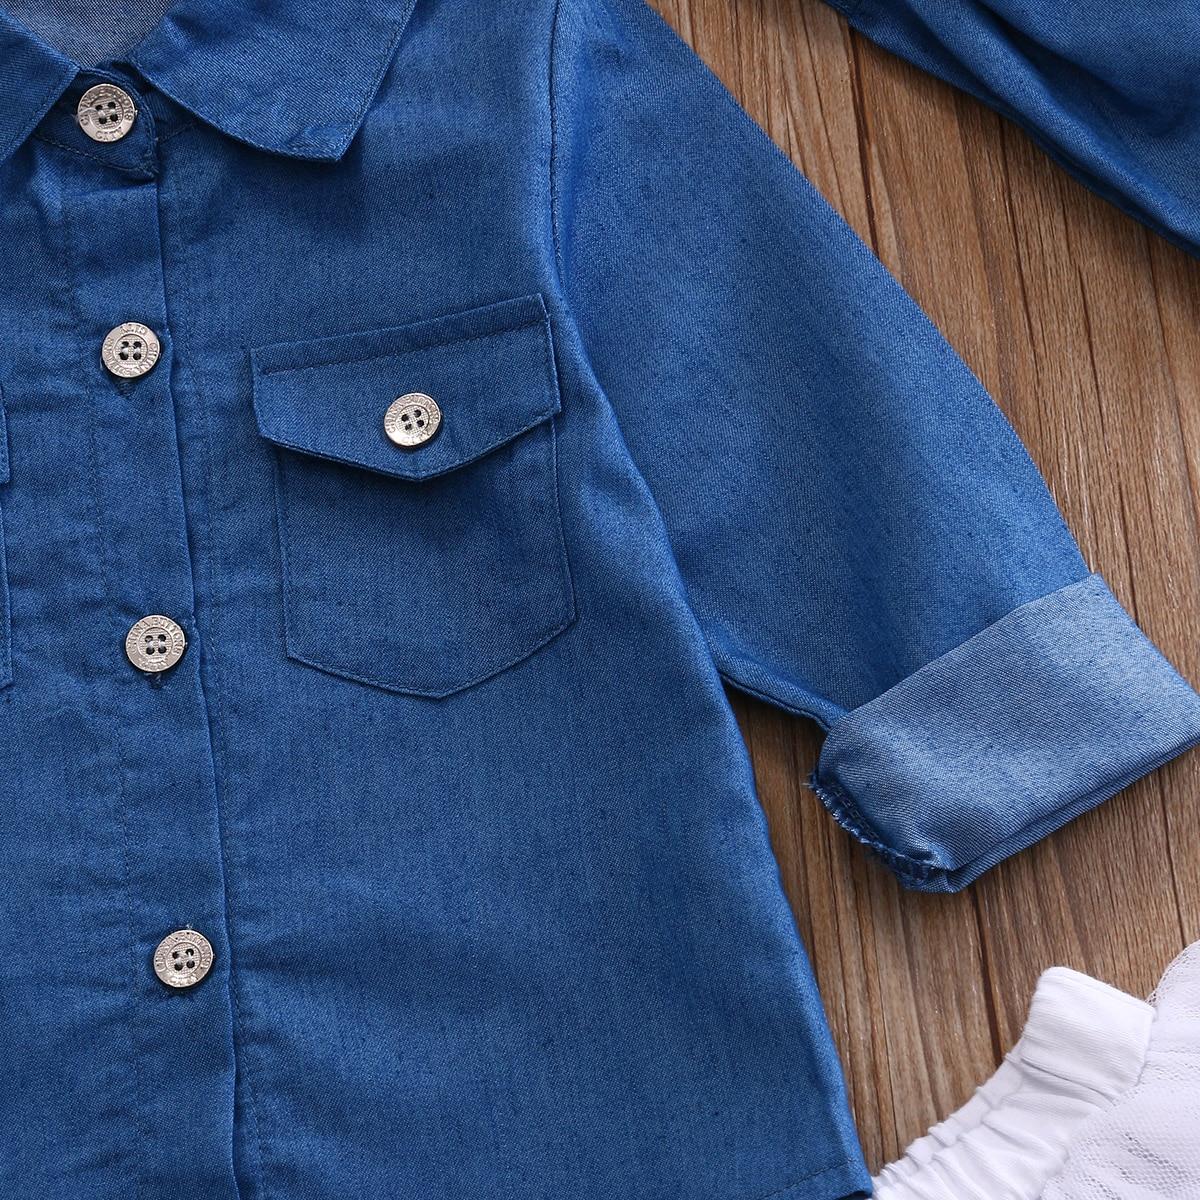 3PCS-Toddler-Kids-Baby-Girl-Clothes-Set-Denim-Tops-T-shirt-Tutu-Skirt-Headband-Outfits-Summer-Cowboy-Suit-Children-Set-0-5Y-2